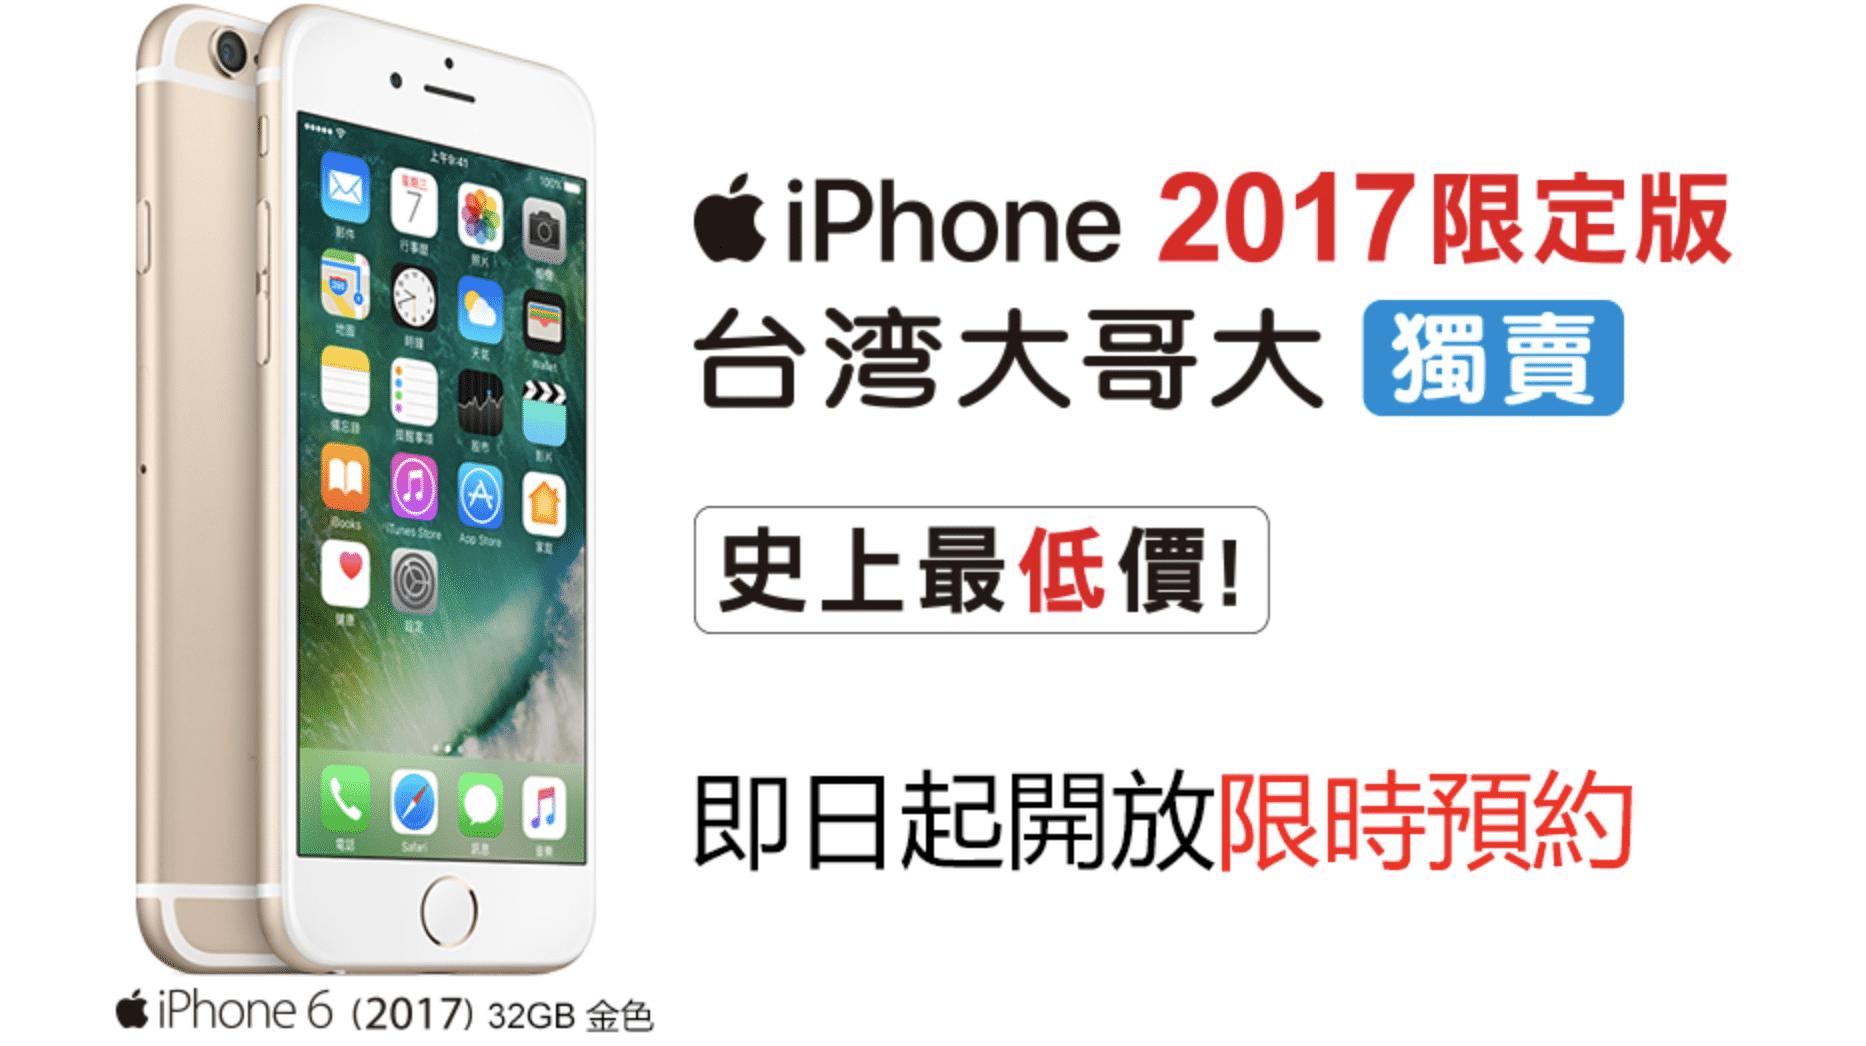 Das alte neue iPhone 6 bei Taiwan Mobile.